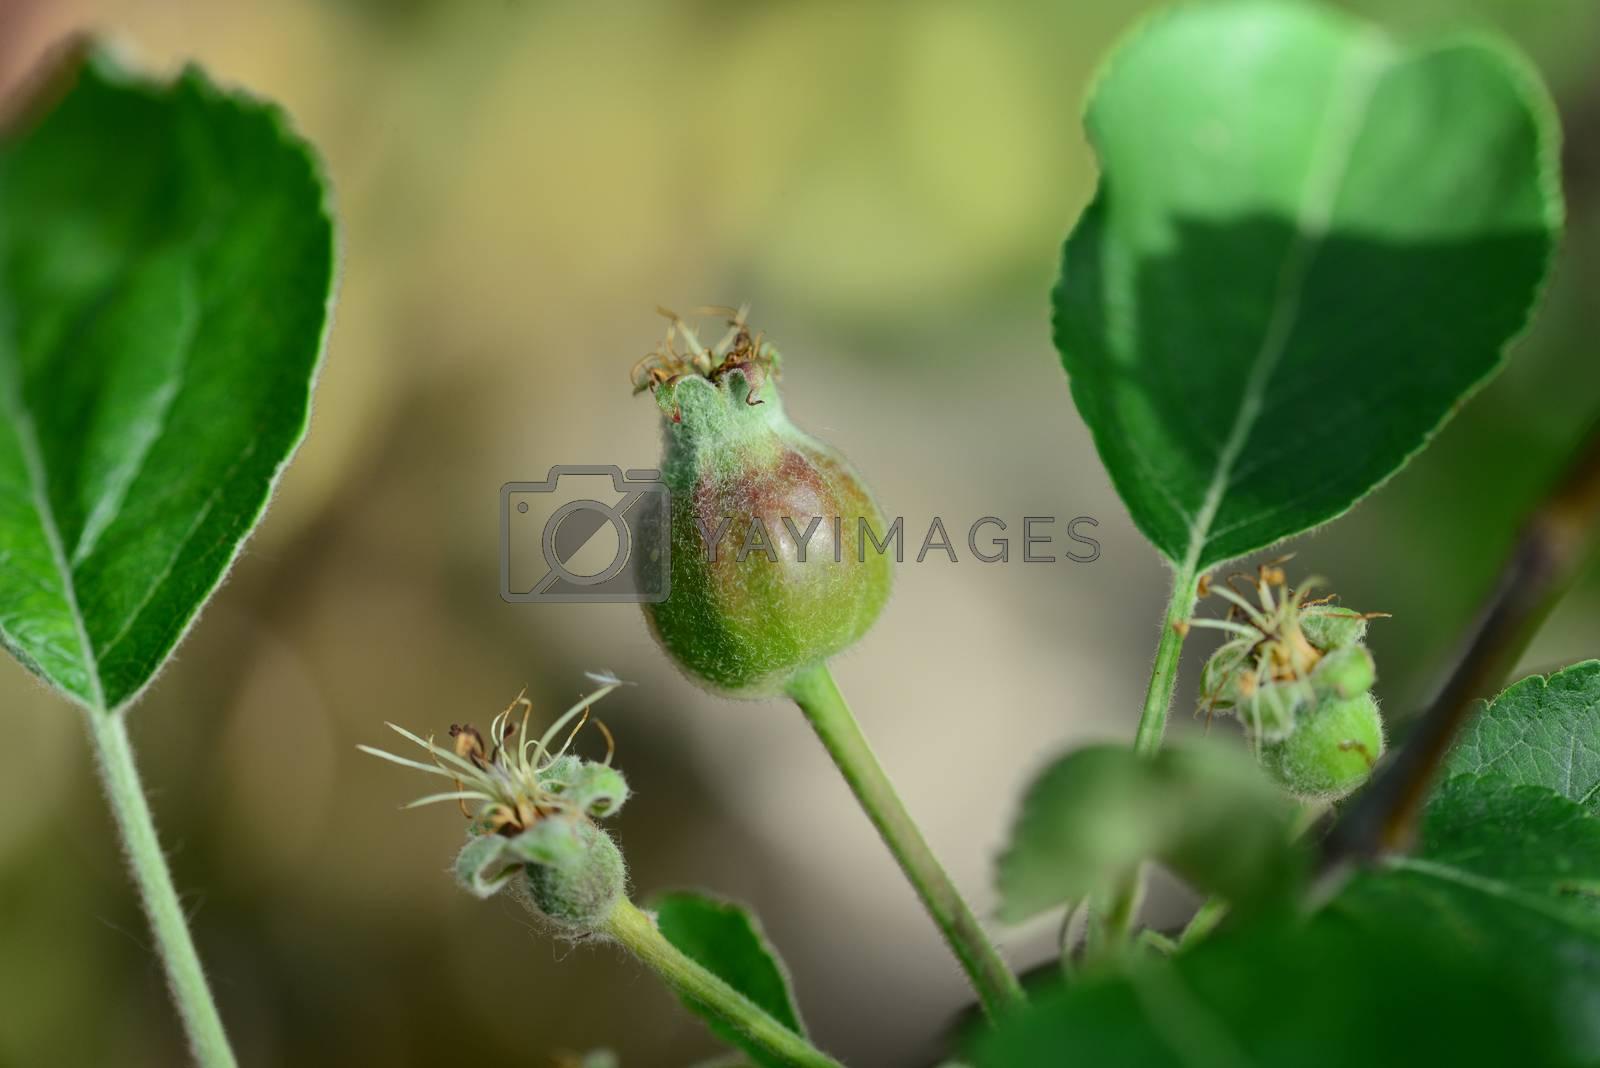 Royalty free image of Unripe Apple Embryo by tony4urban